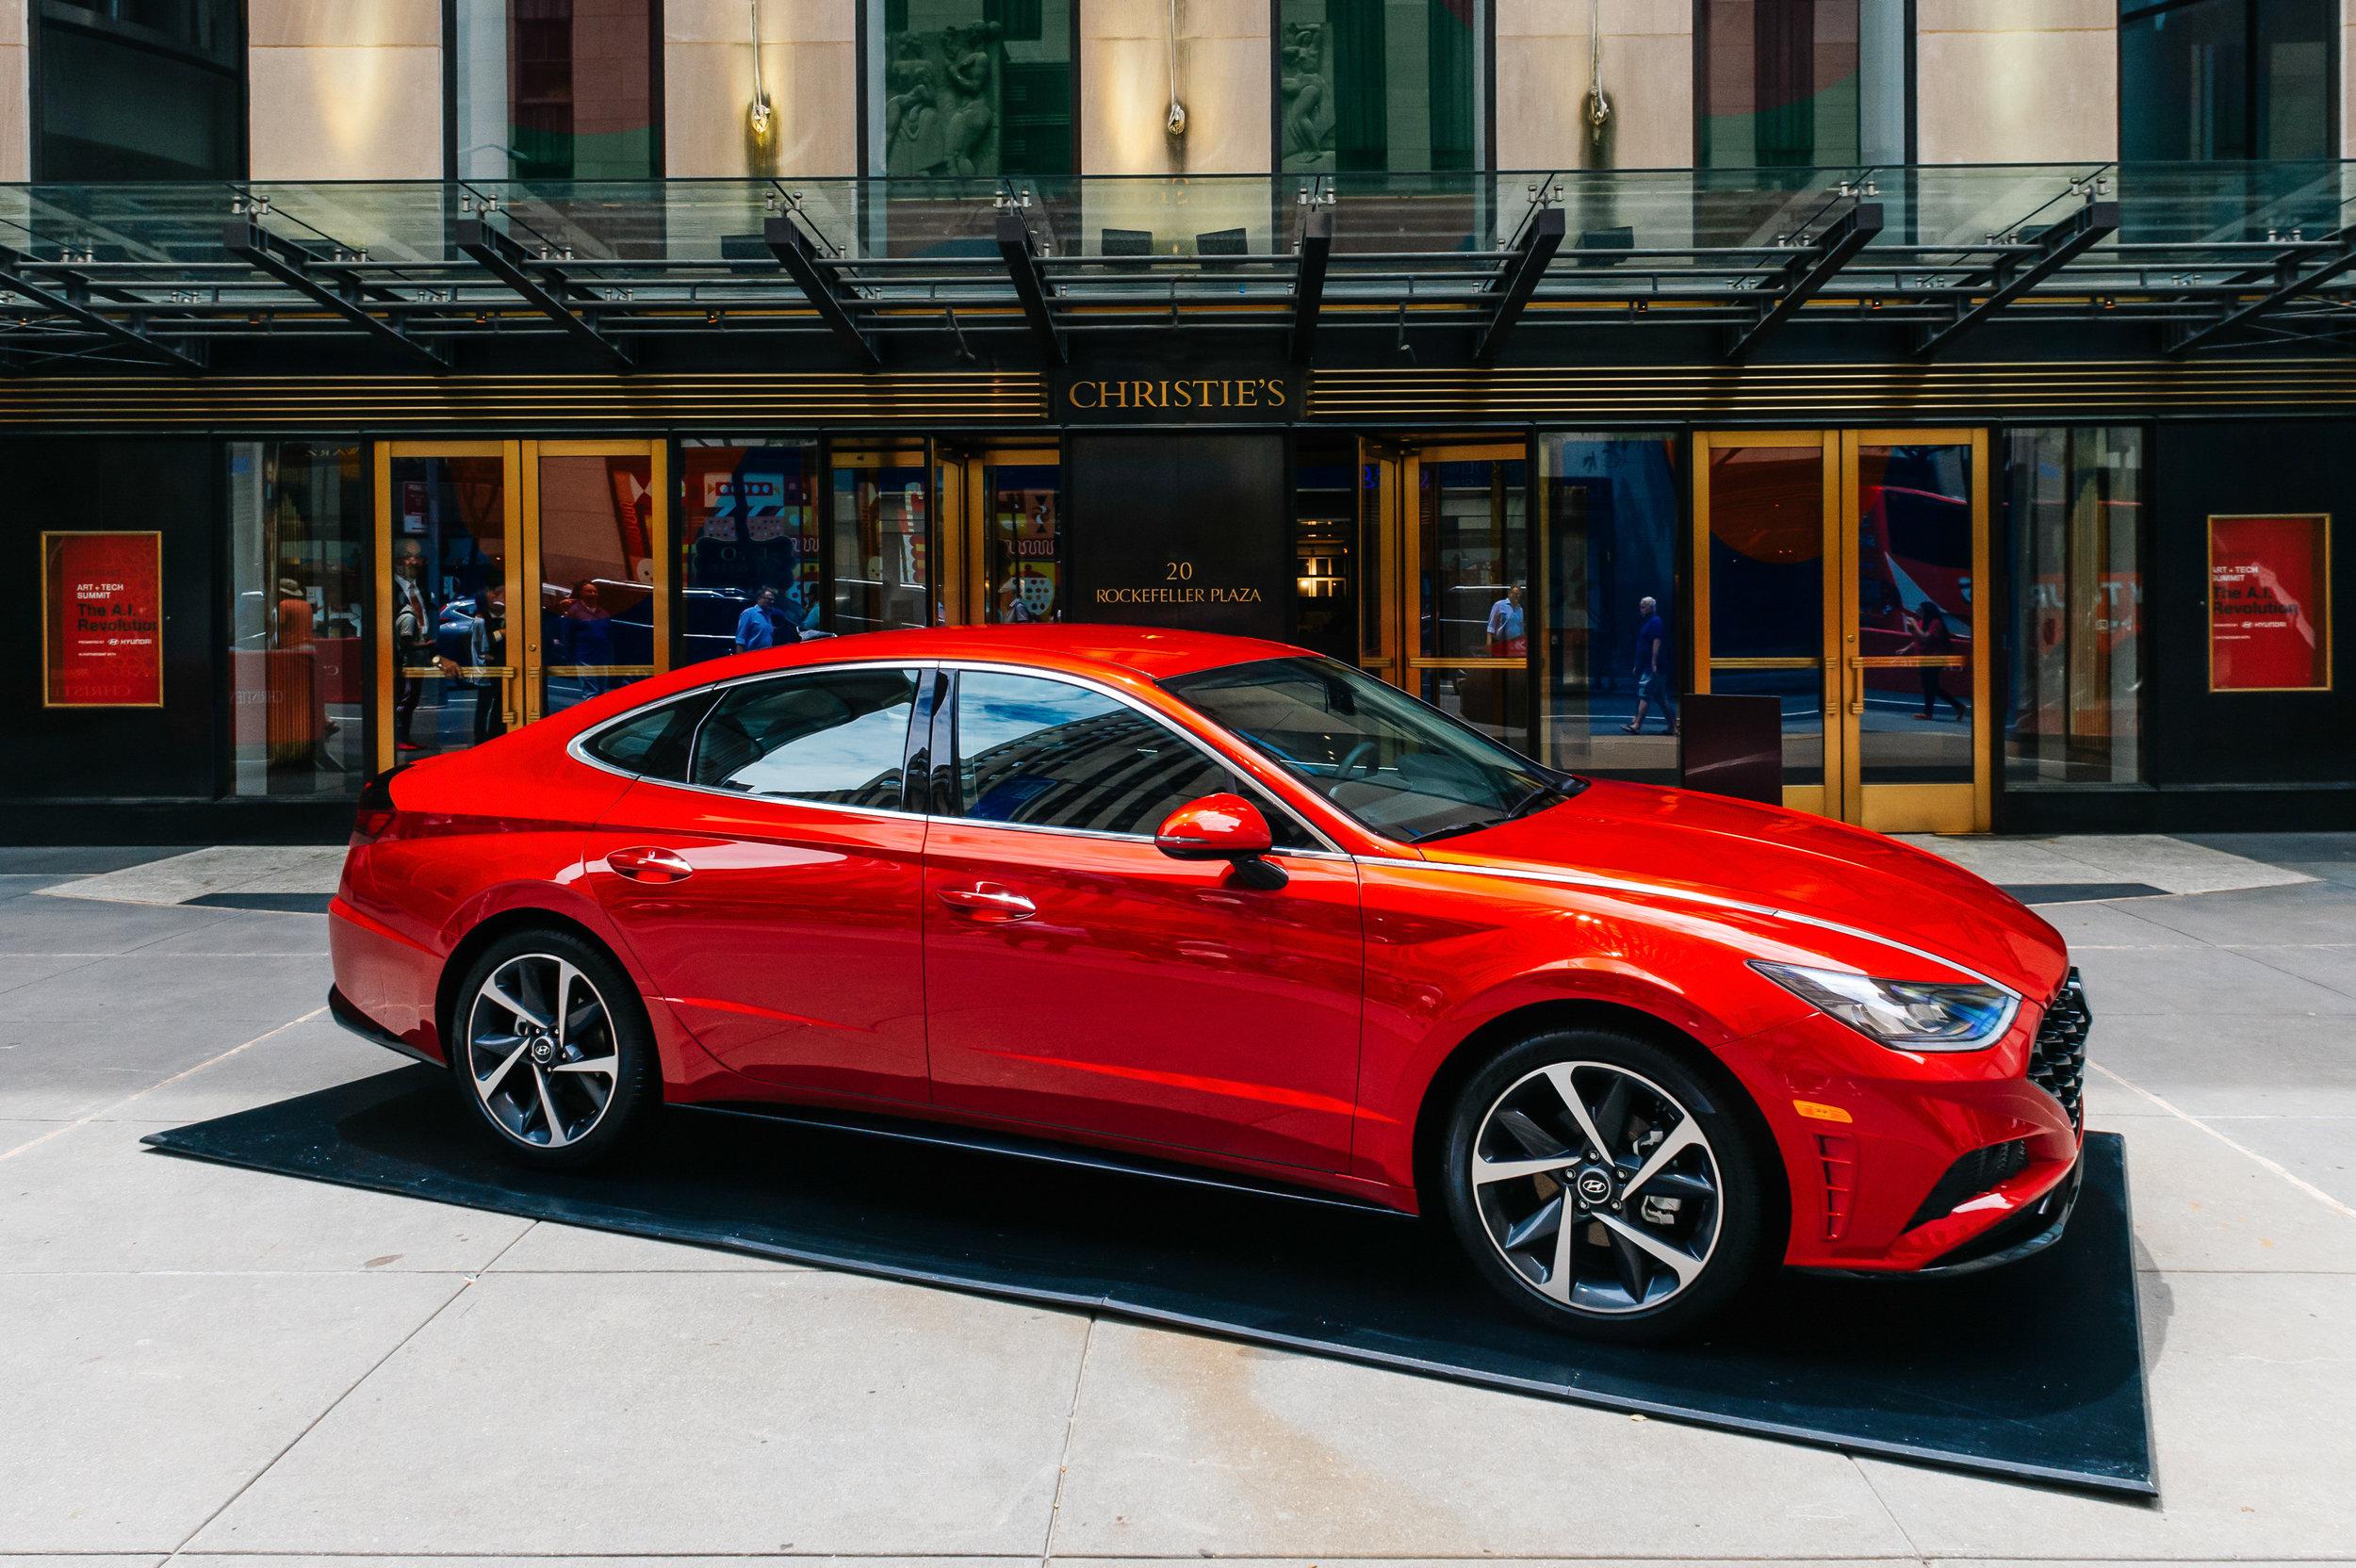 OHelloMedia-Hyundai-Christie'sAuctionHouse-TopSelect-23.jpg